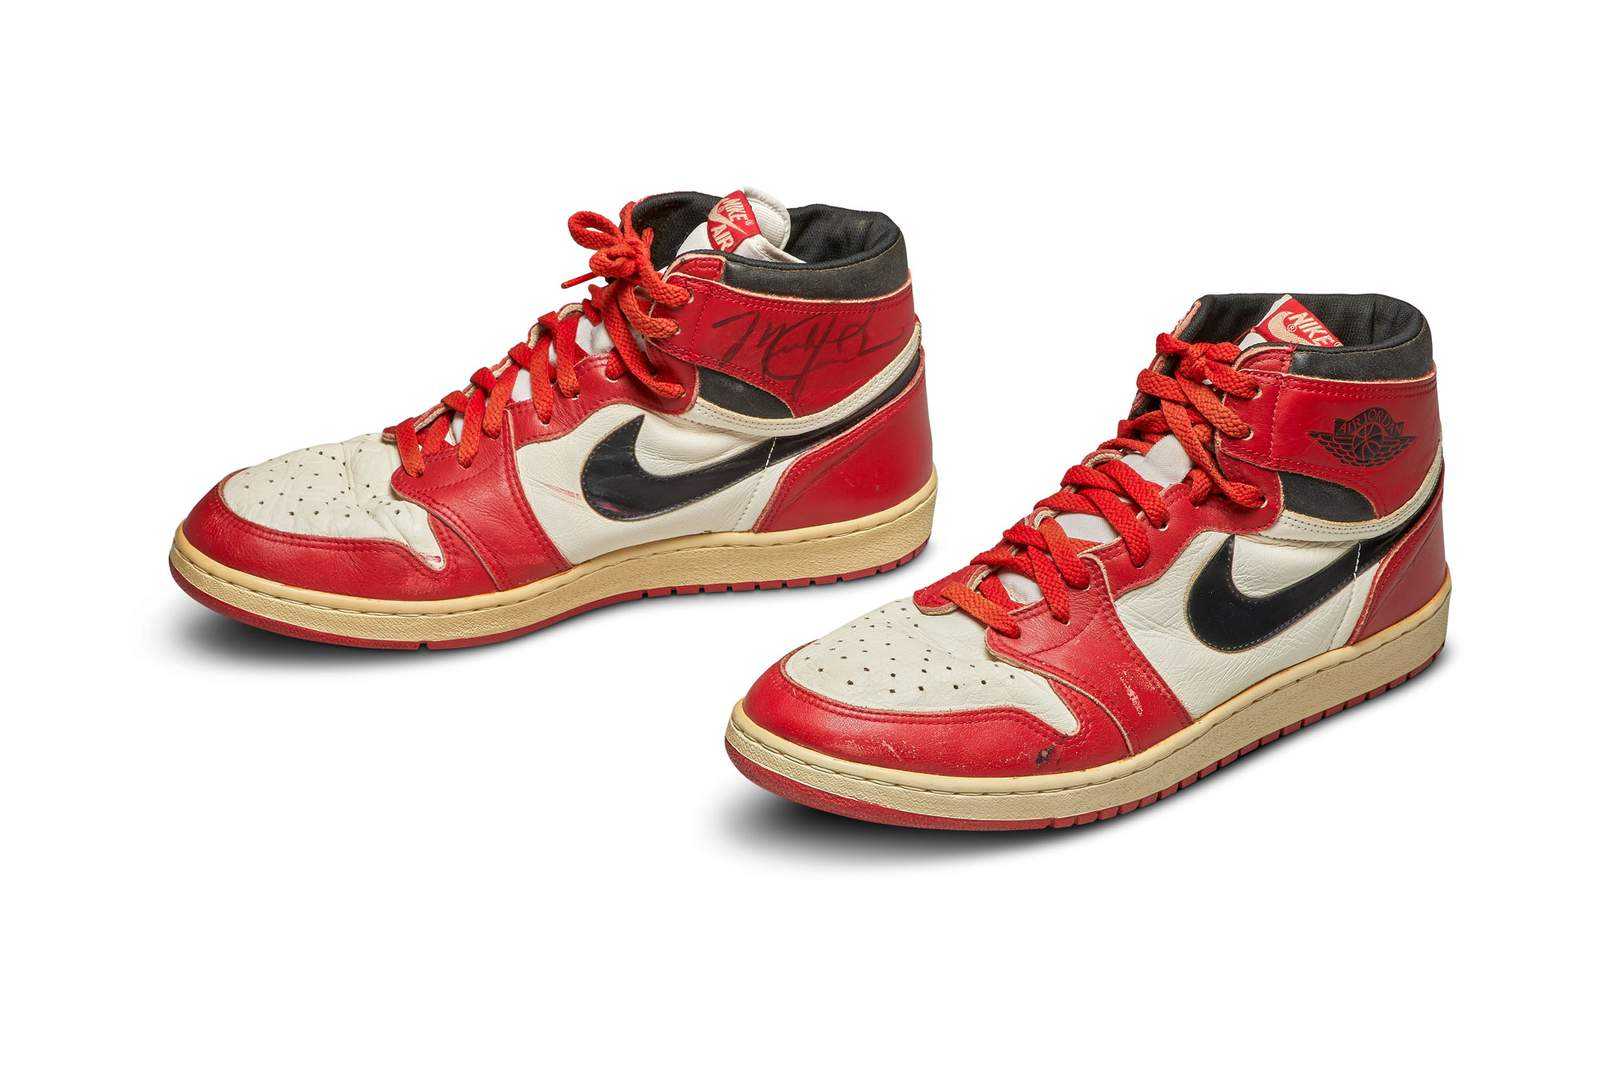 Air Jordan Shoes From 1985